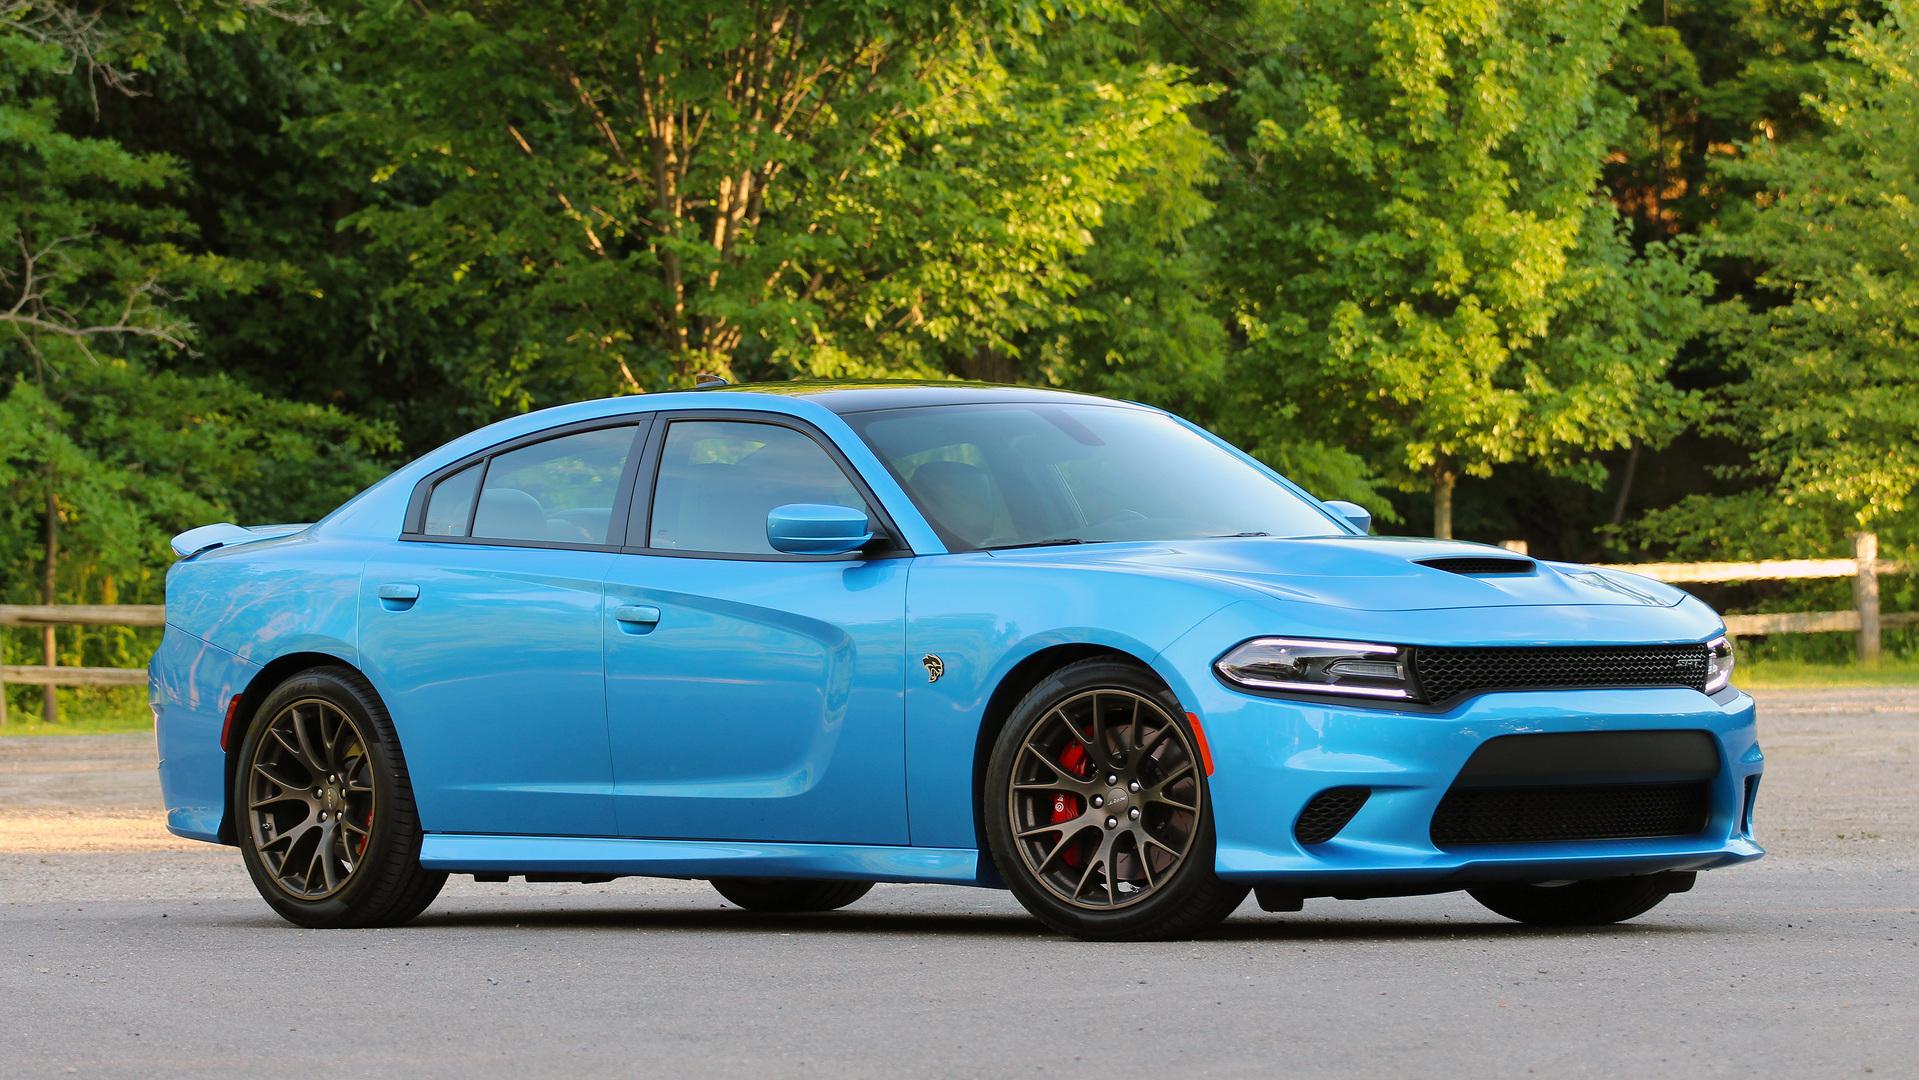 Dodge Charger Srt Hellcat >> Review 2016 Dodge Charger Srt Hellcat